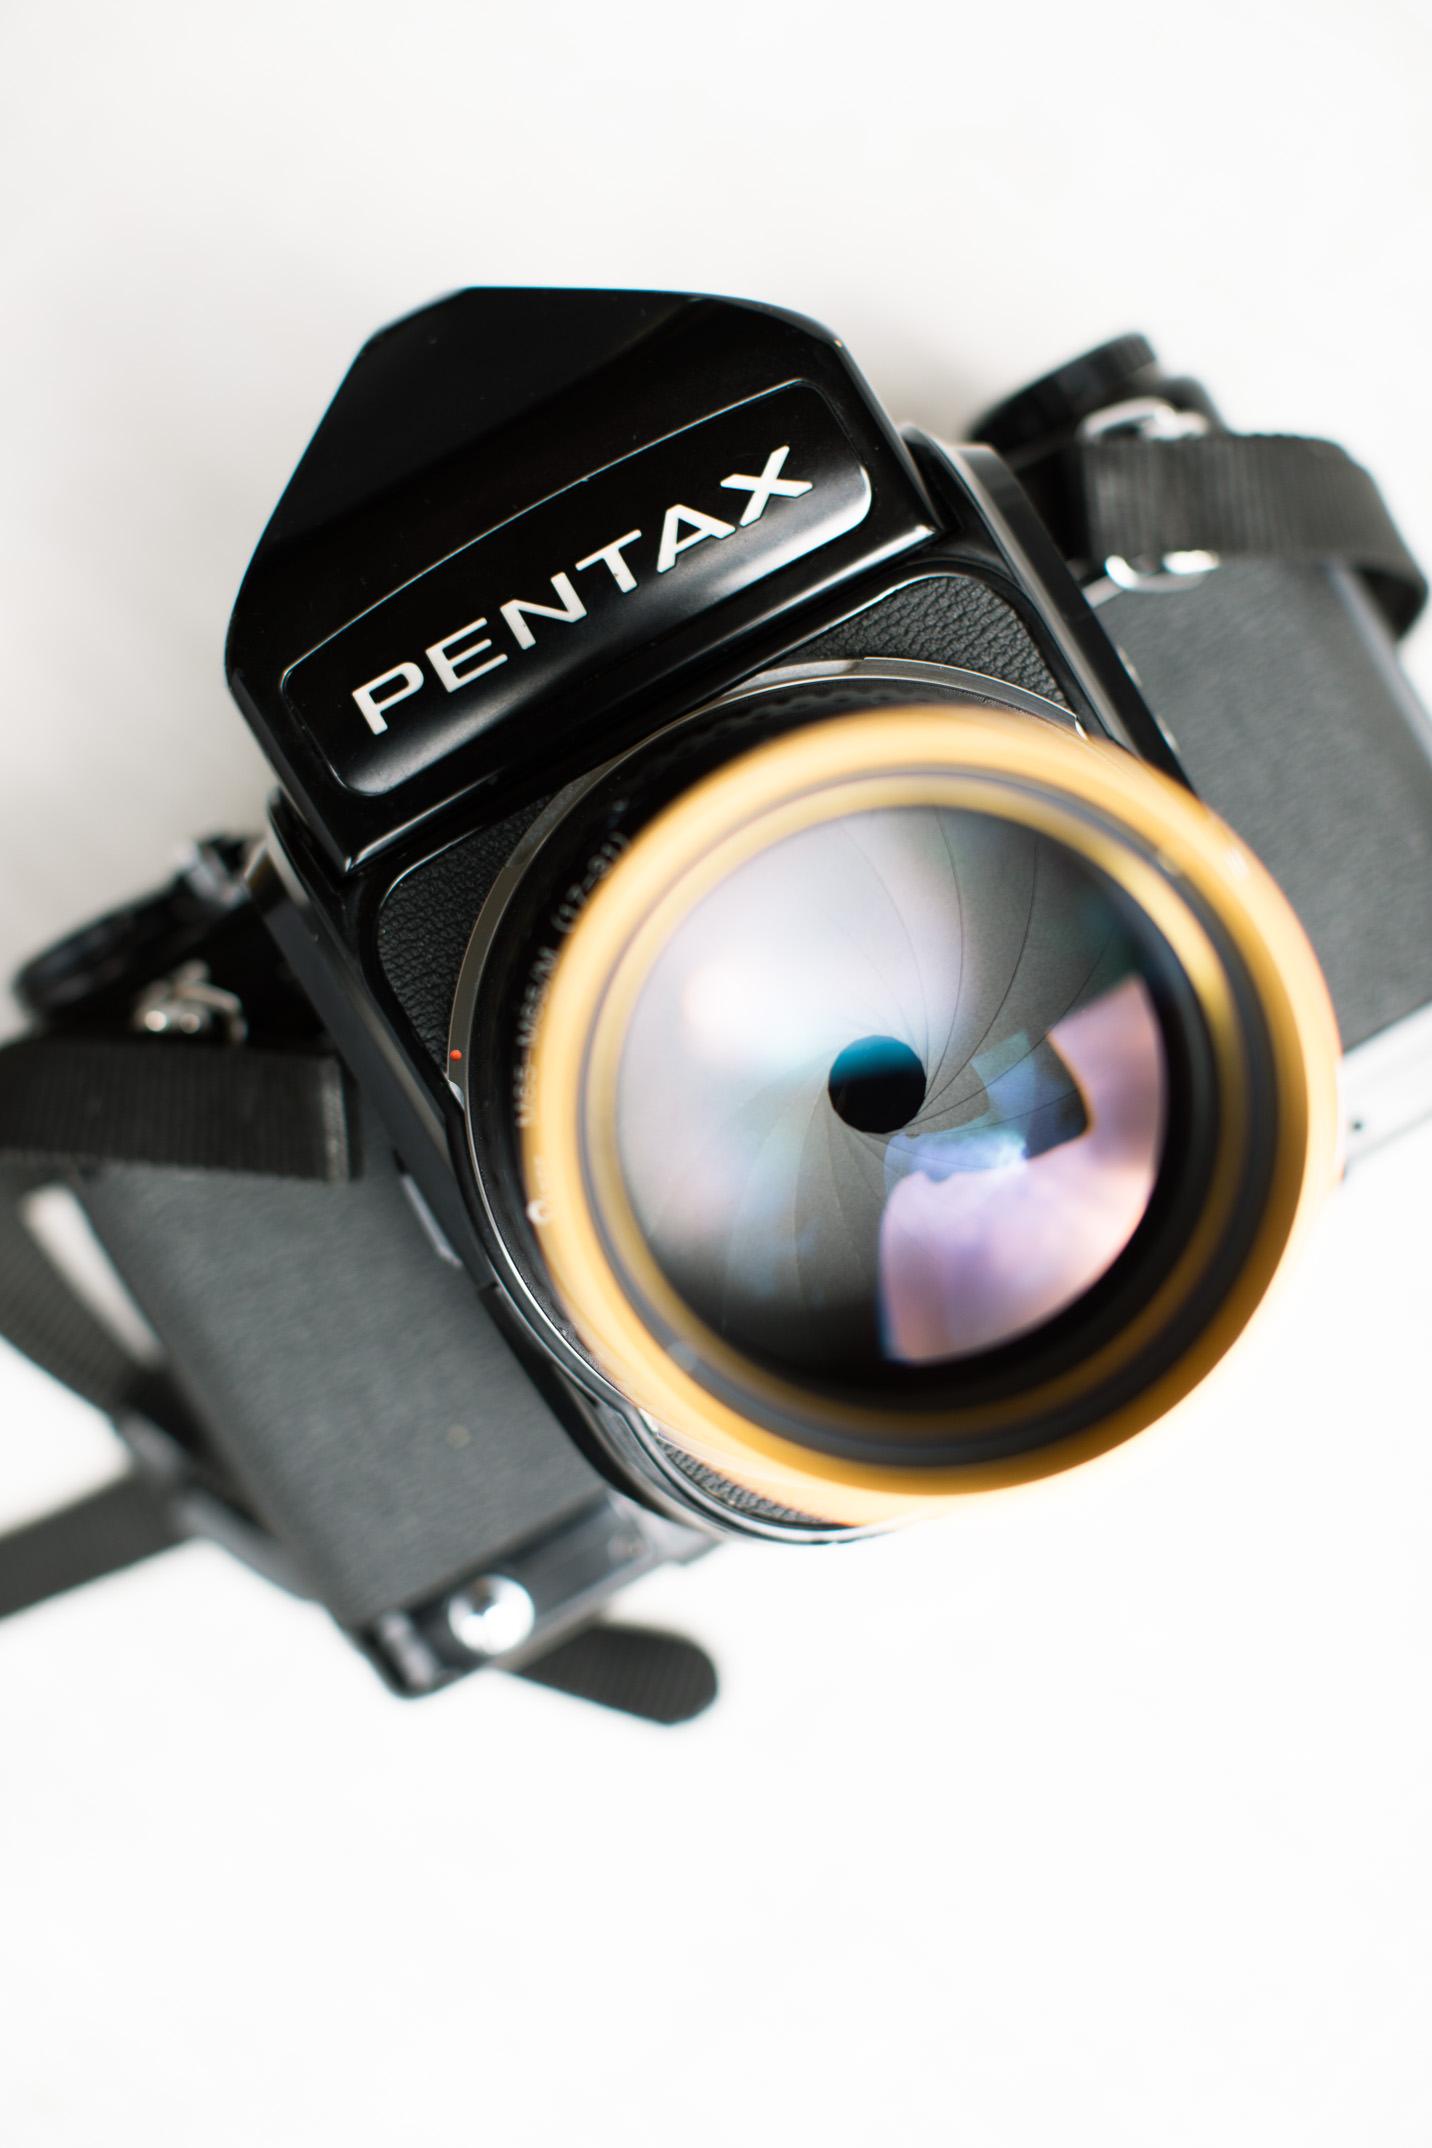 Photo of Schneider Cine-Xenon 115mm f/2 mounted on a Pentax 67 film camera